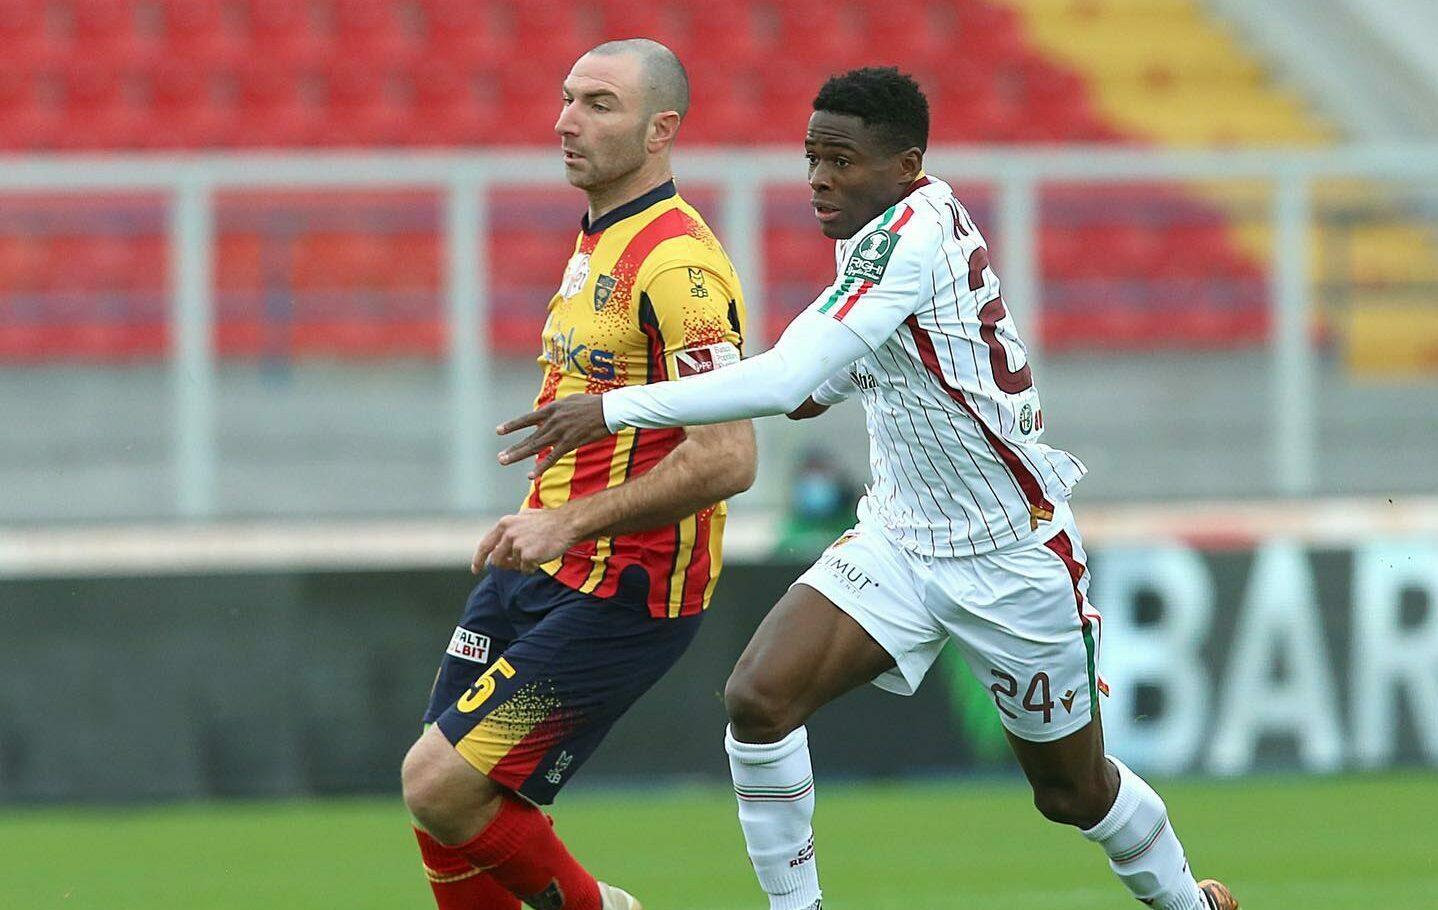 Augustus Kargbo opened his Reggiana account this season